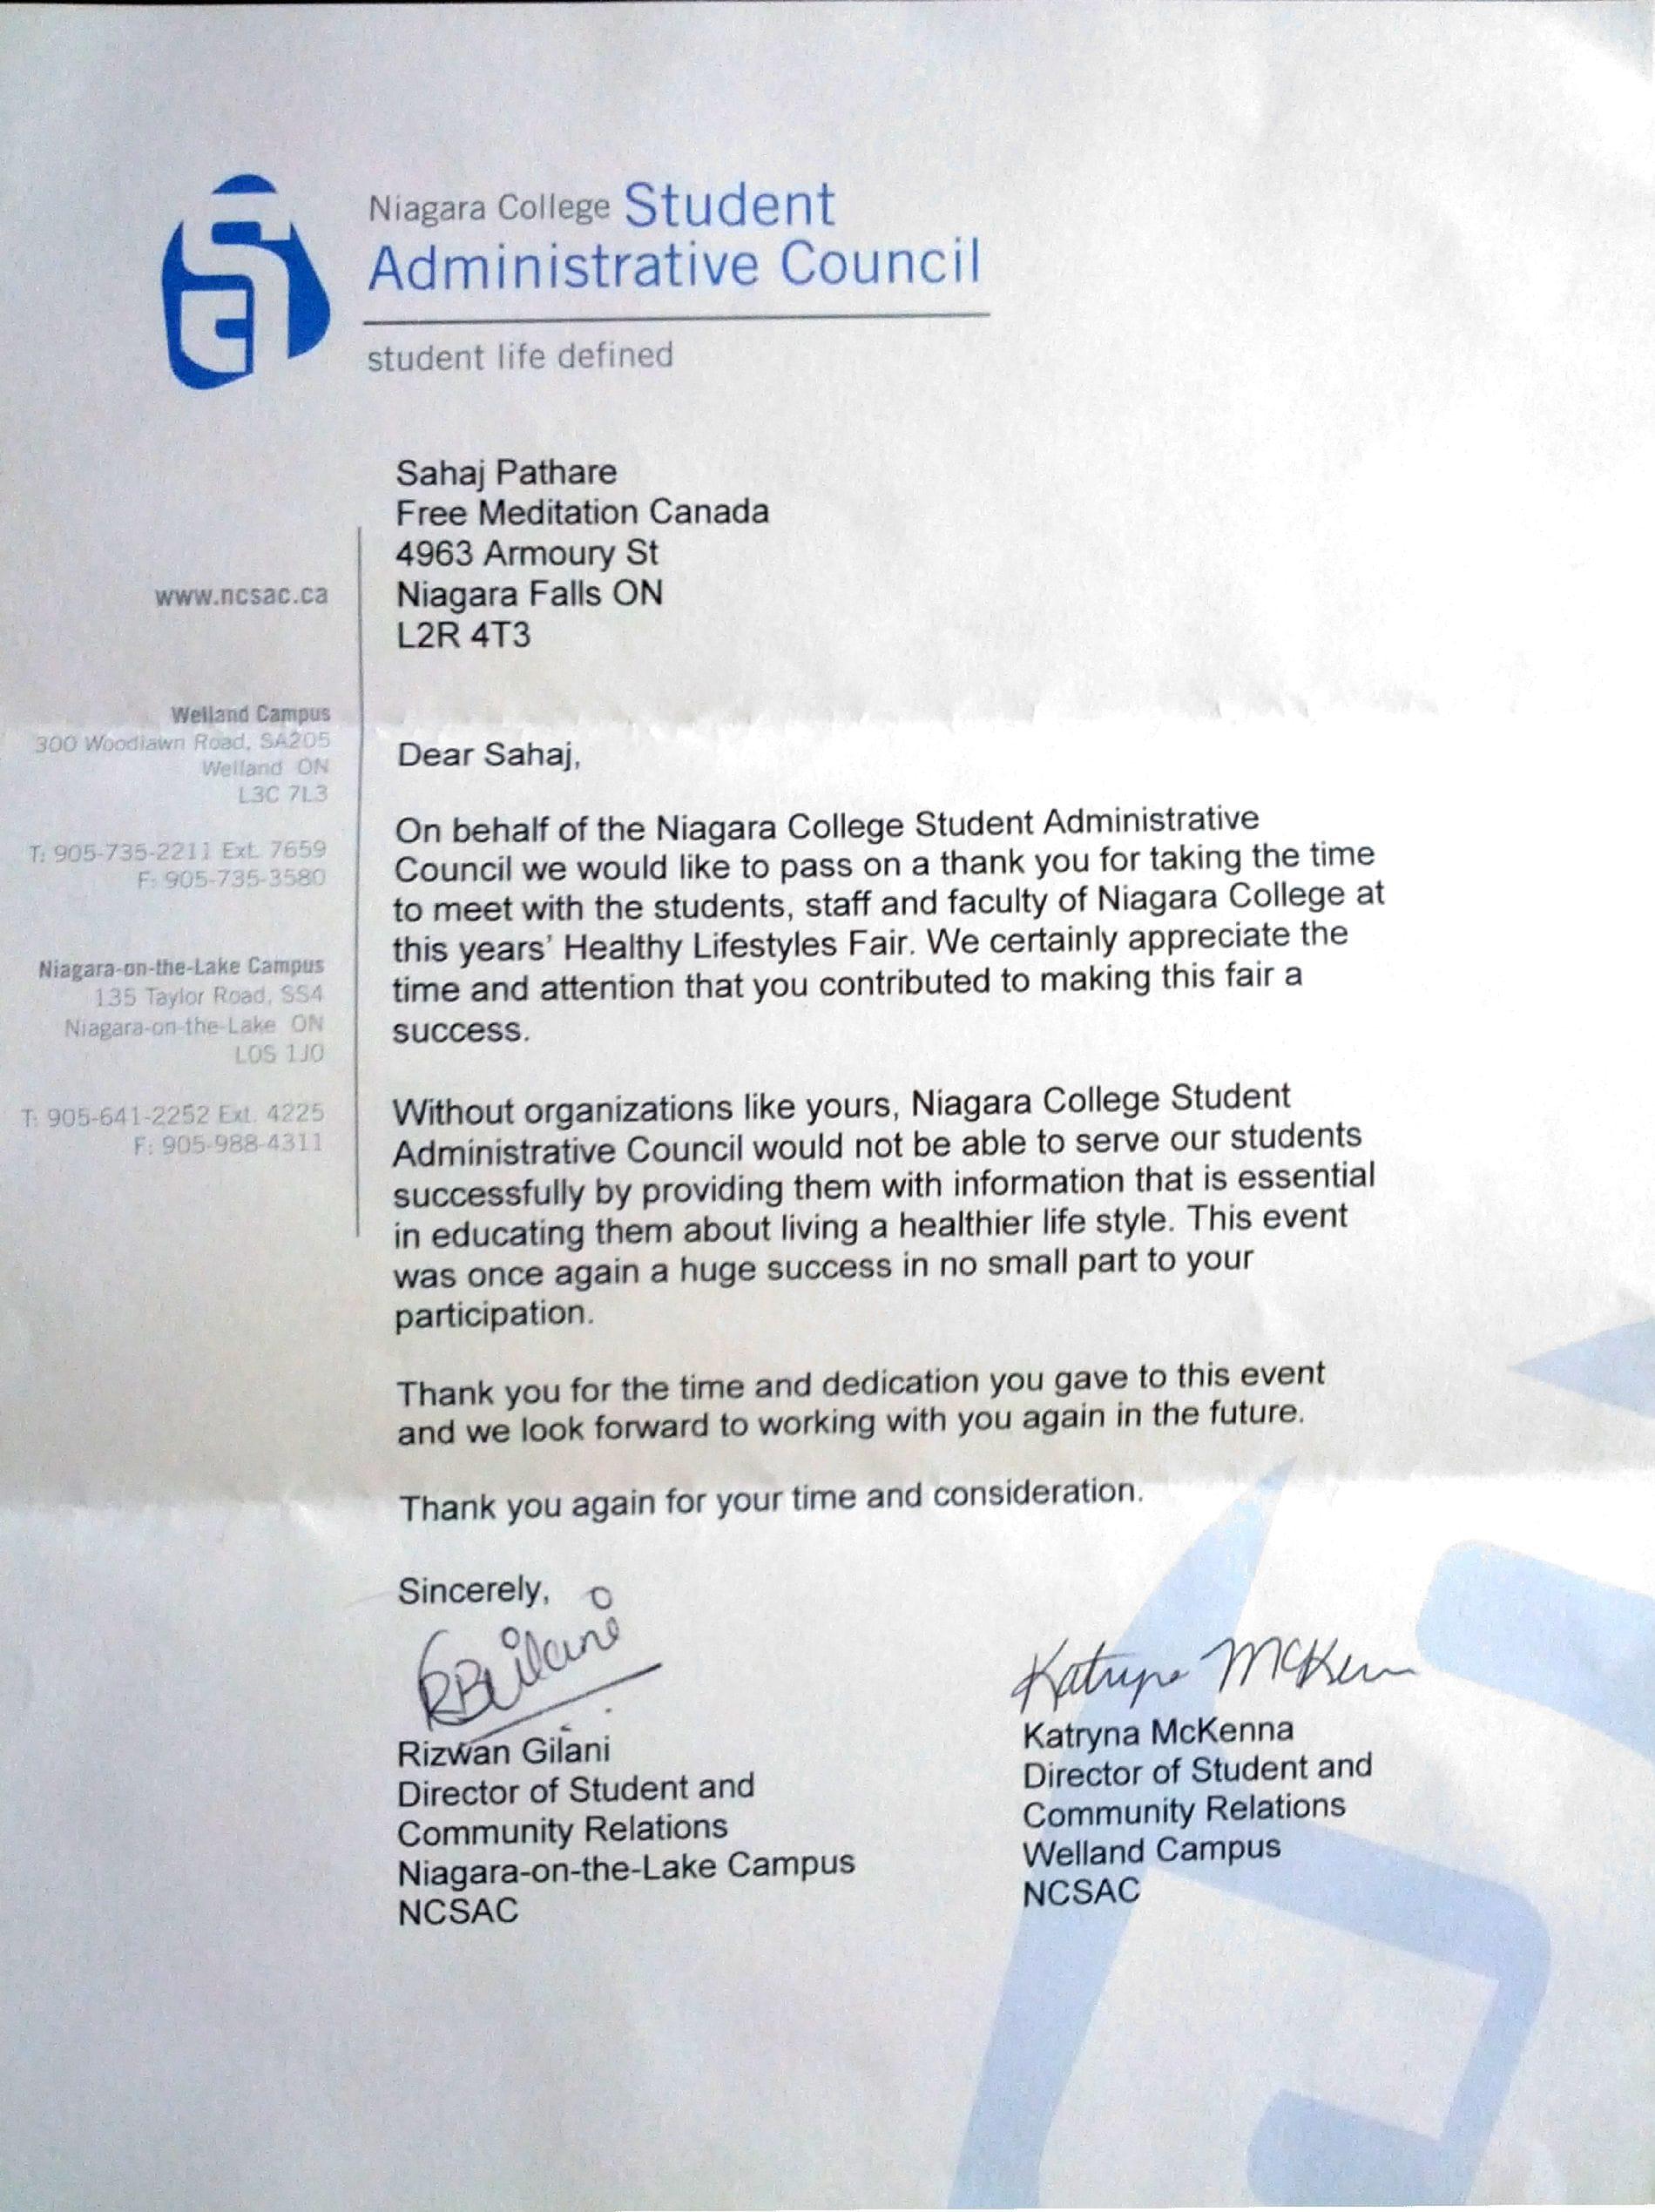 Appreciation letter from Niagara College -2013